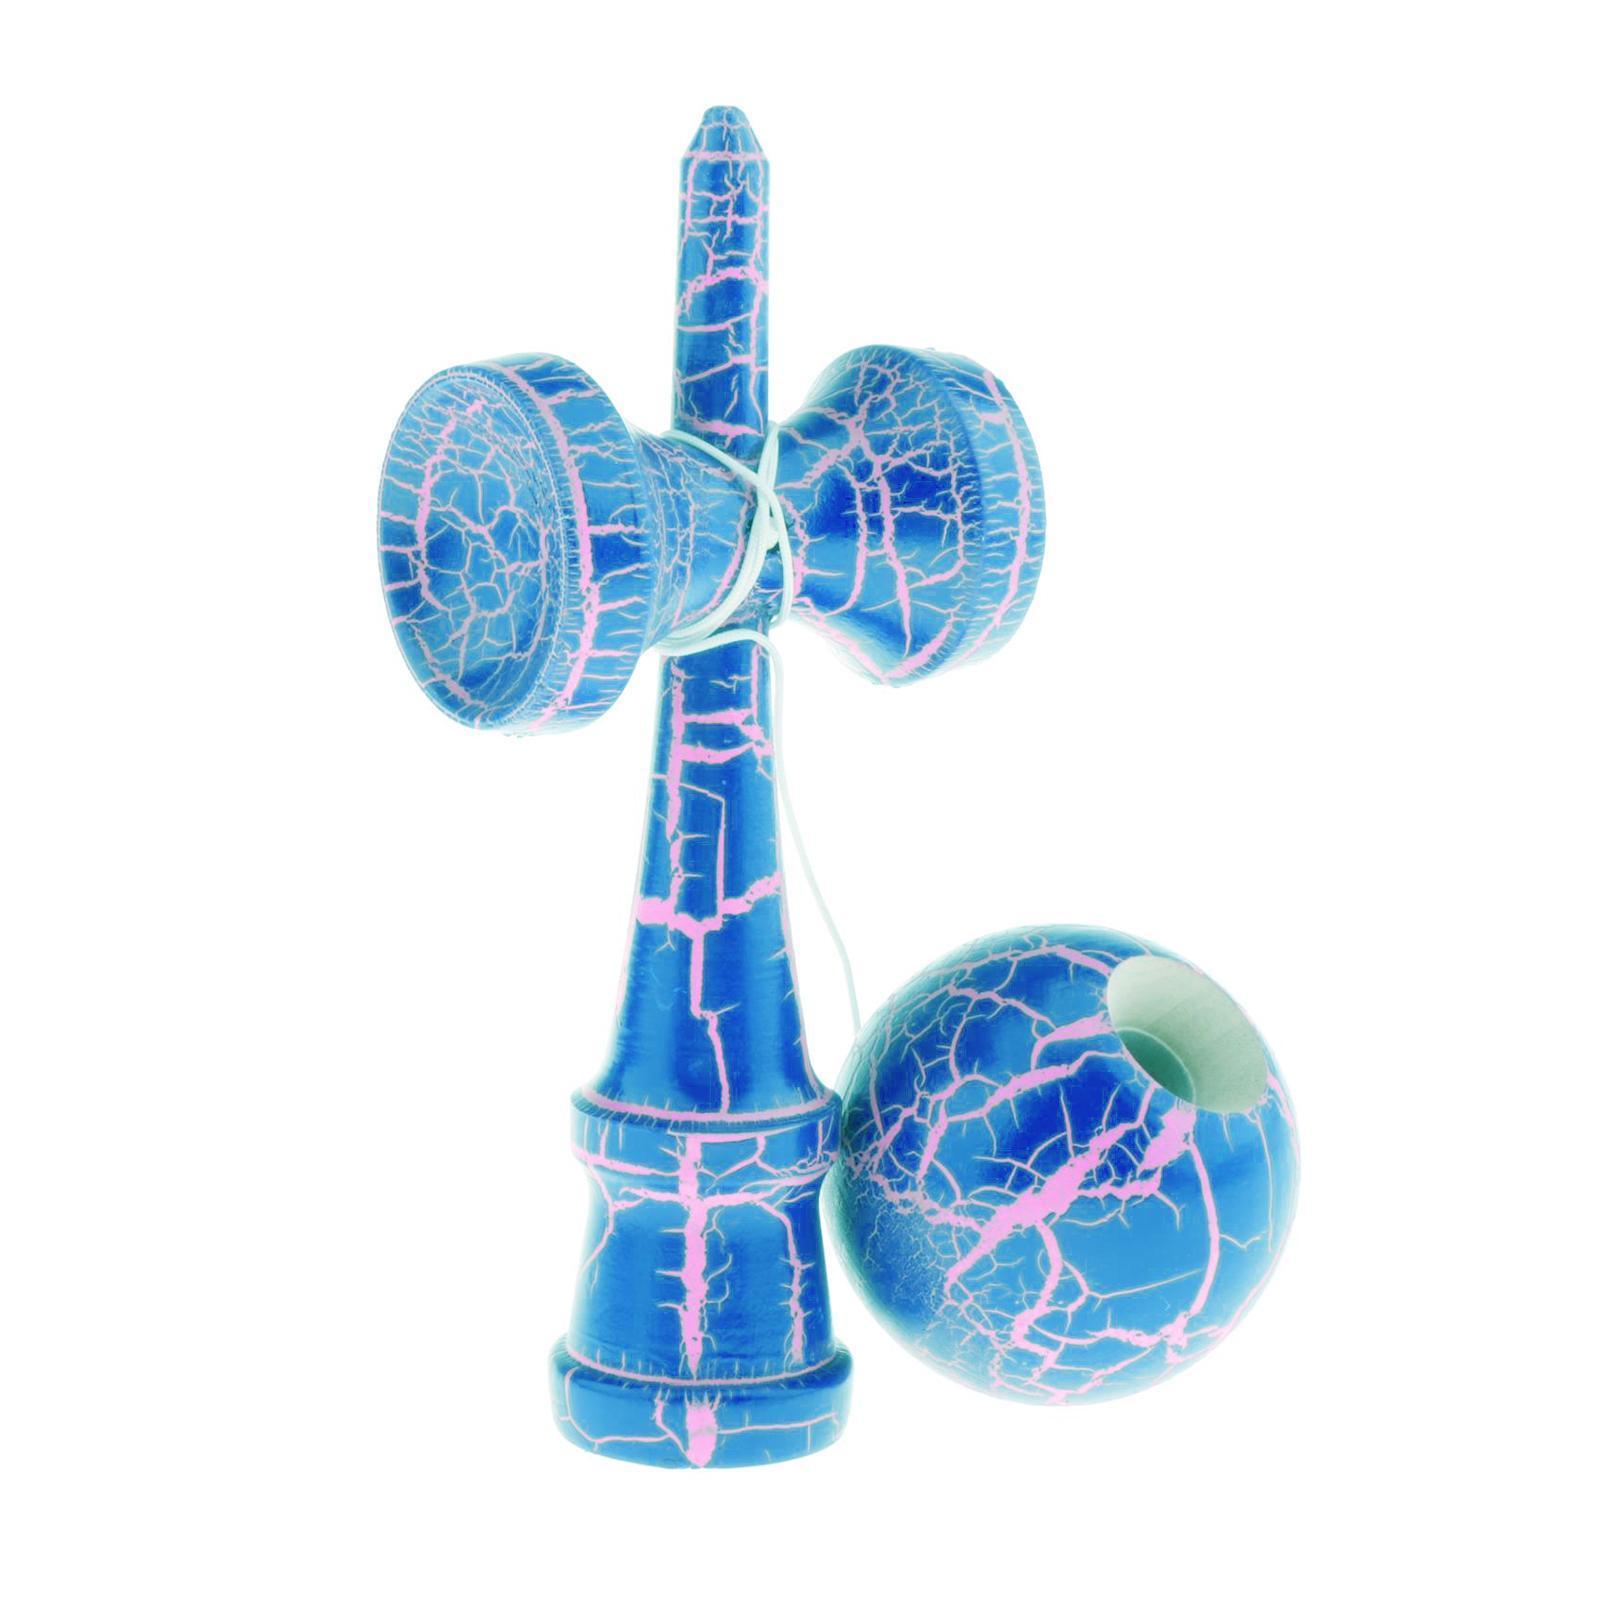 Wooden Kendama Balls Balance Skill Toys Colorful Crack Beech Wood Surface Kids